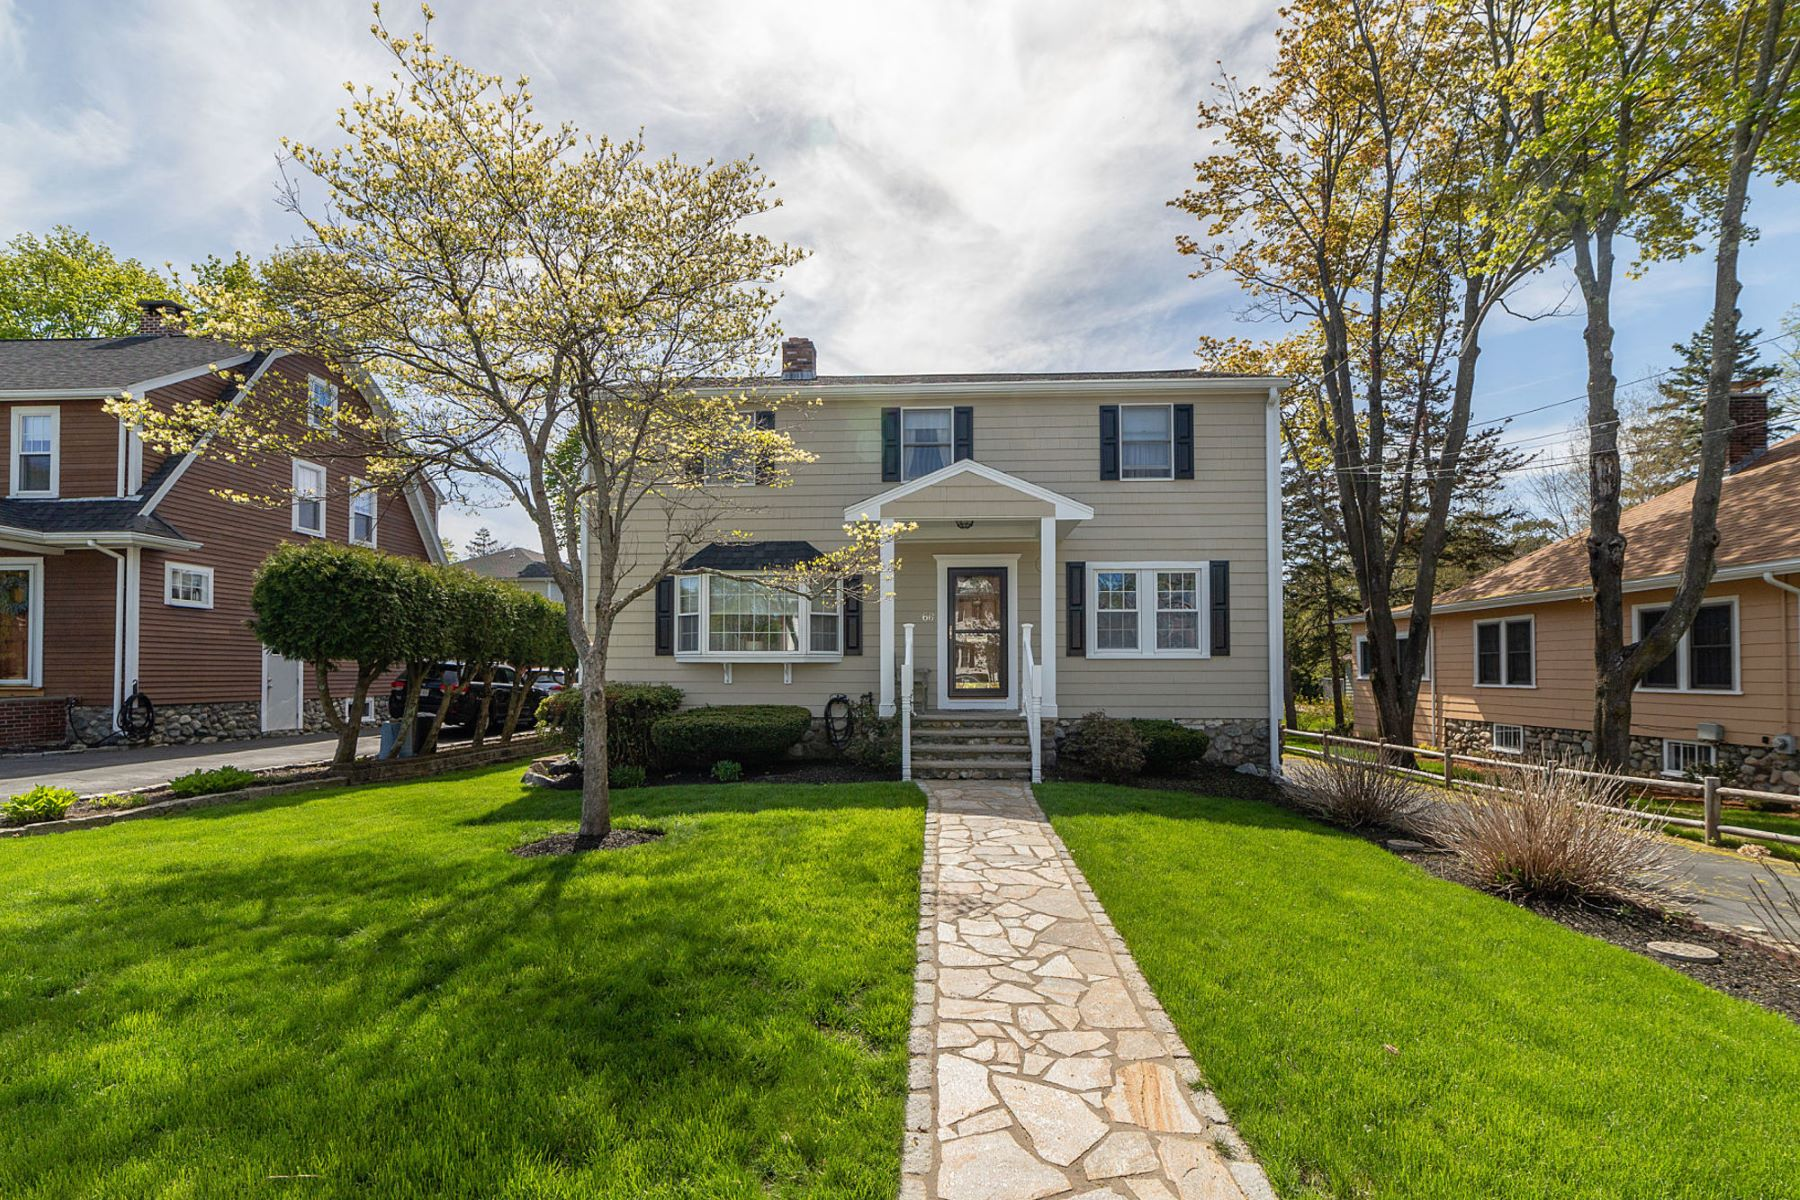 Single Family Homes for Active at 66 East St Melrose, Massachusetts 02176 United States